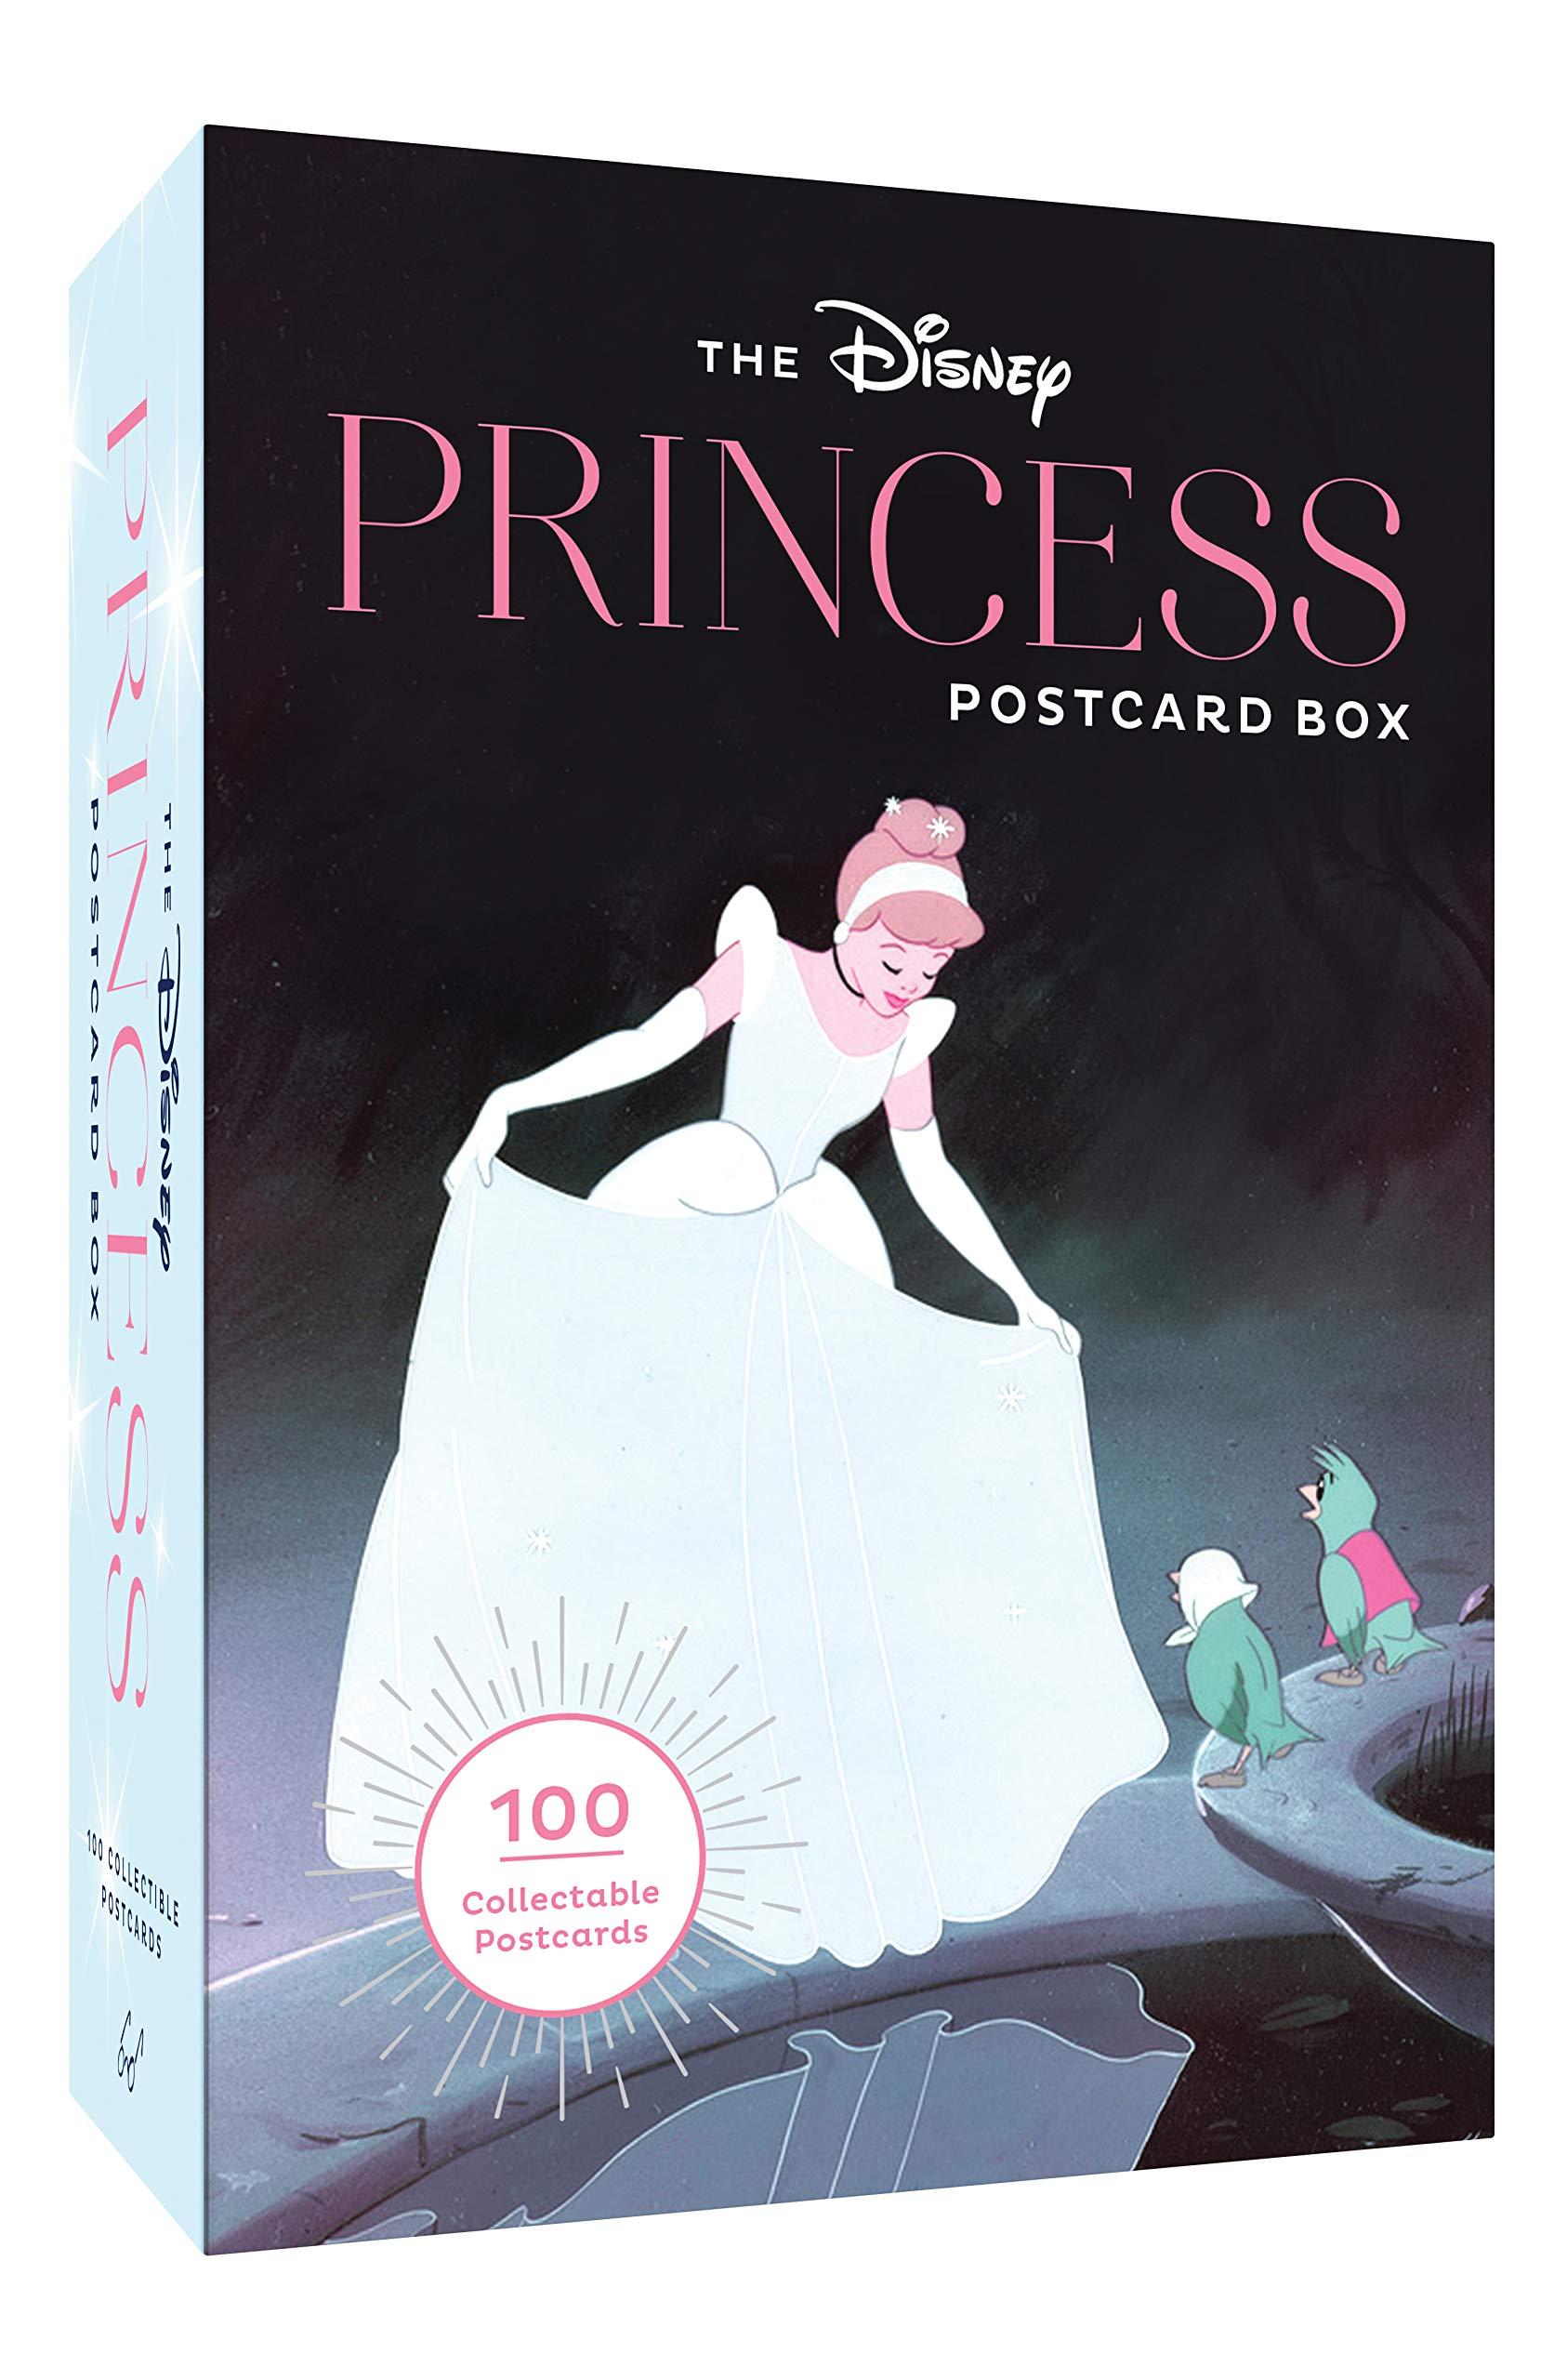 the disney princess postcard box 100 collectible postcards